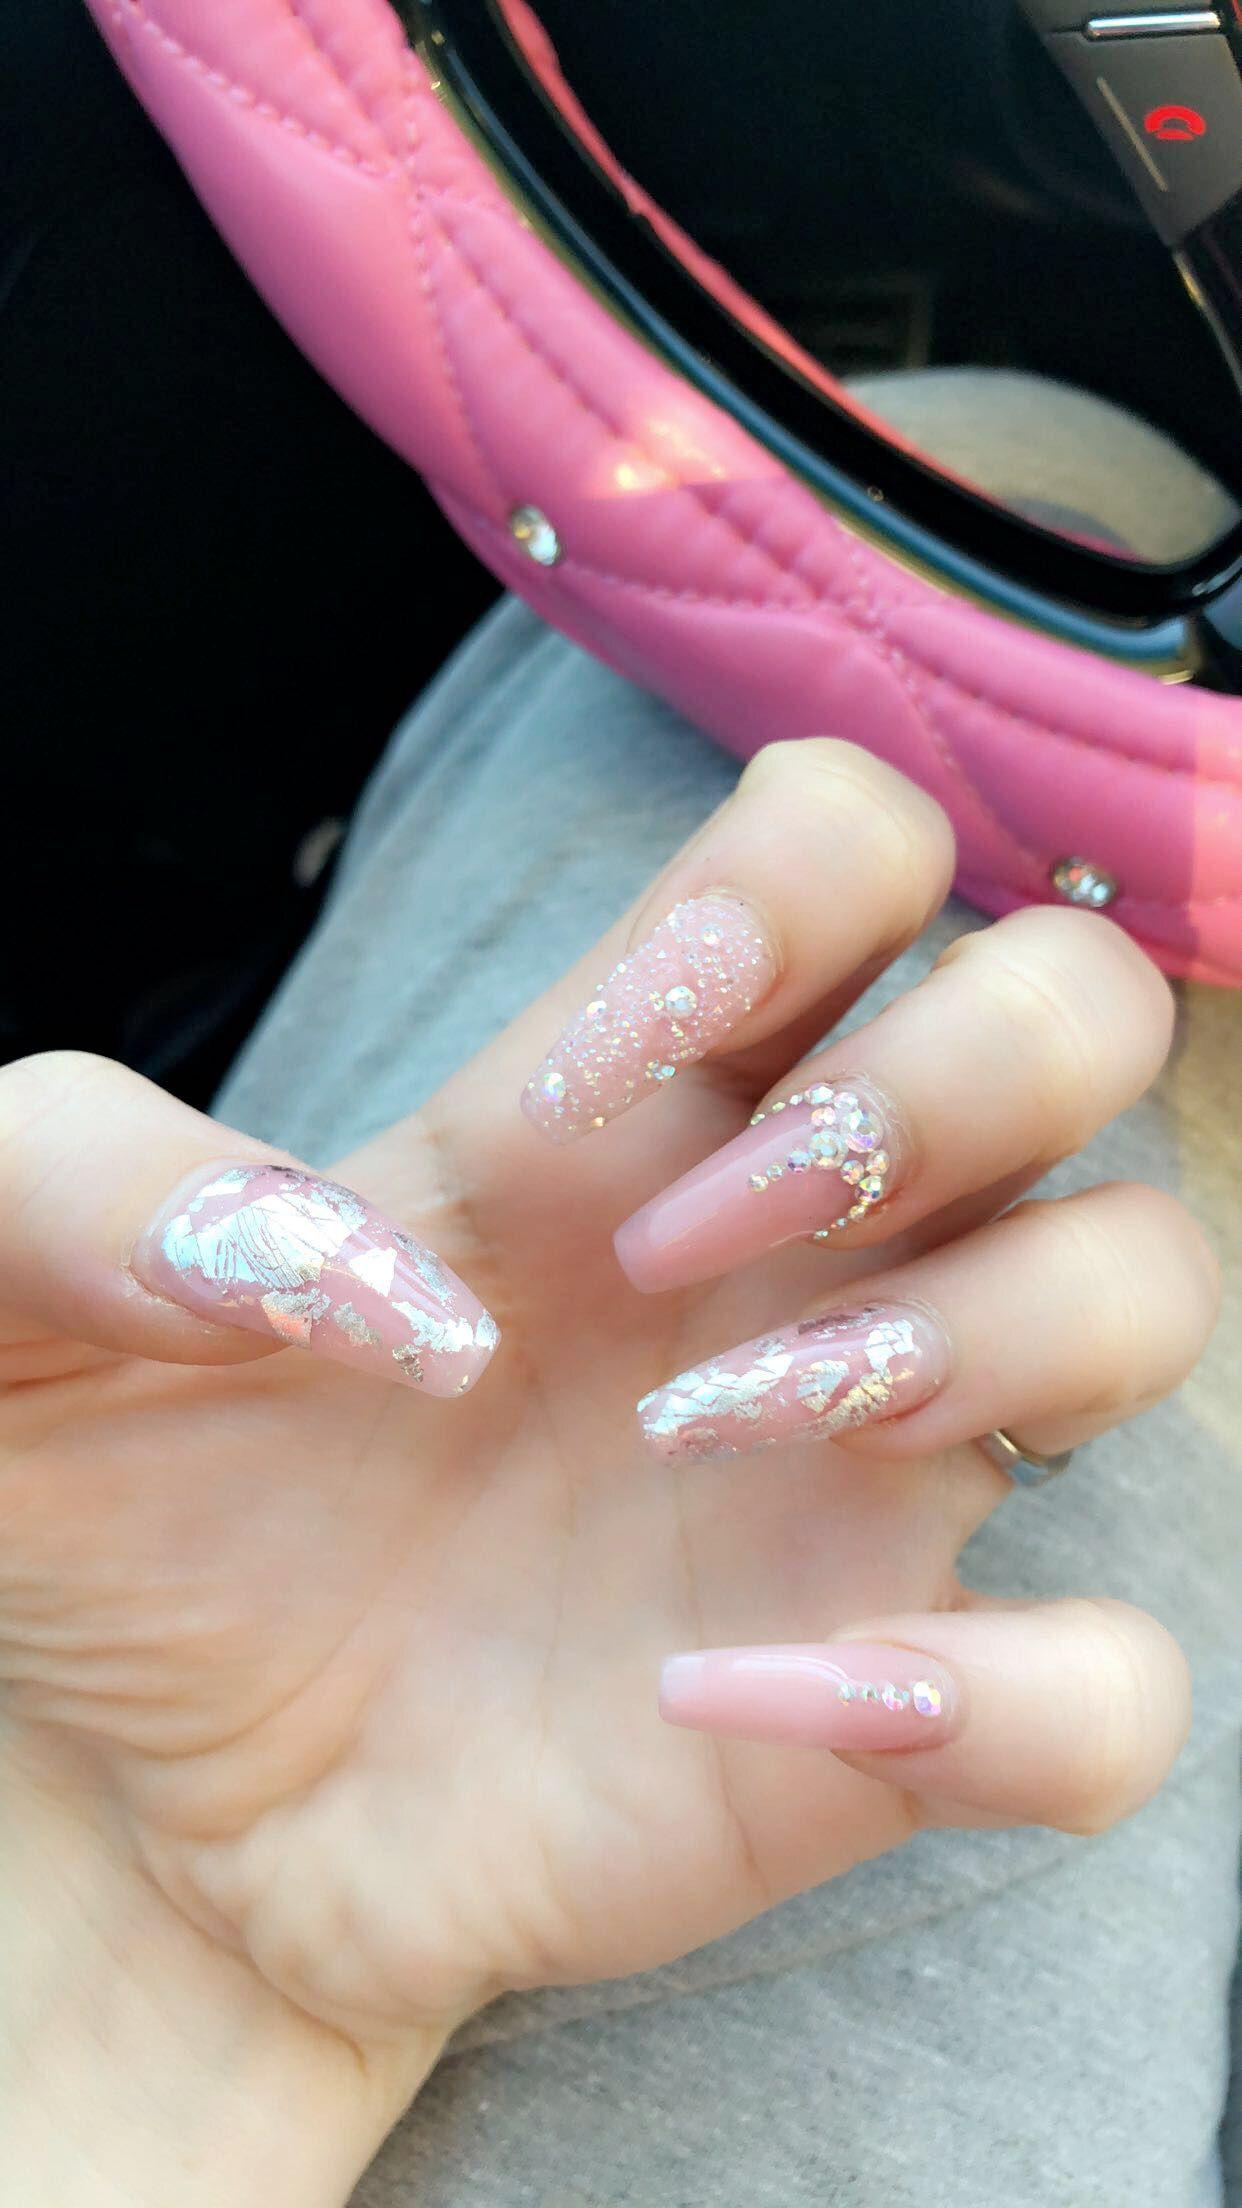 Light Pink Nails Nails Coffin Acrylic Diamonds Pink Claws Boujee Blush Pink Nails Light Pink Acrylic Nails Pink Acrylic Nails